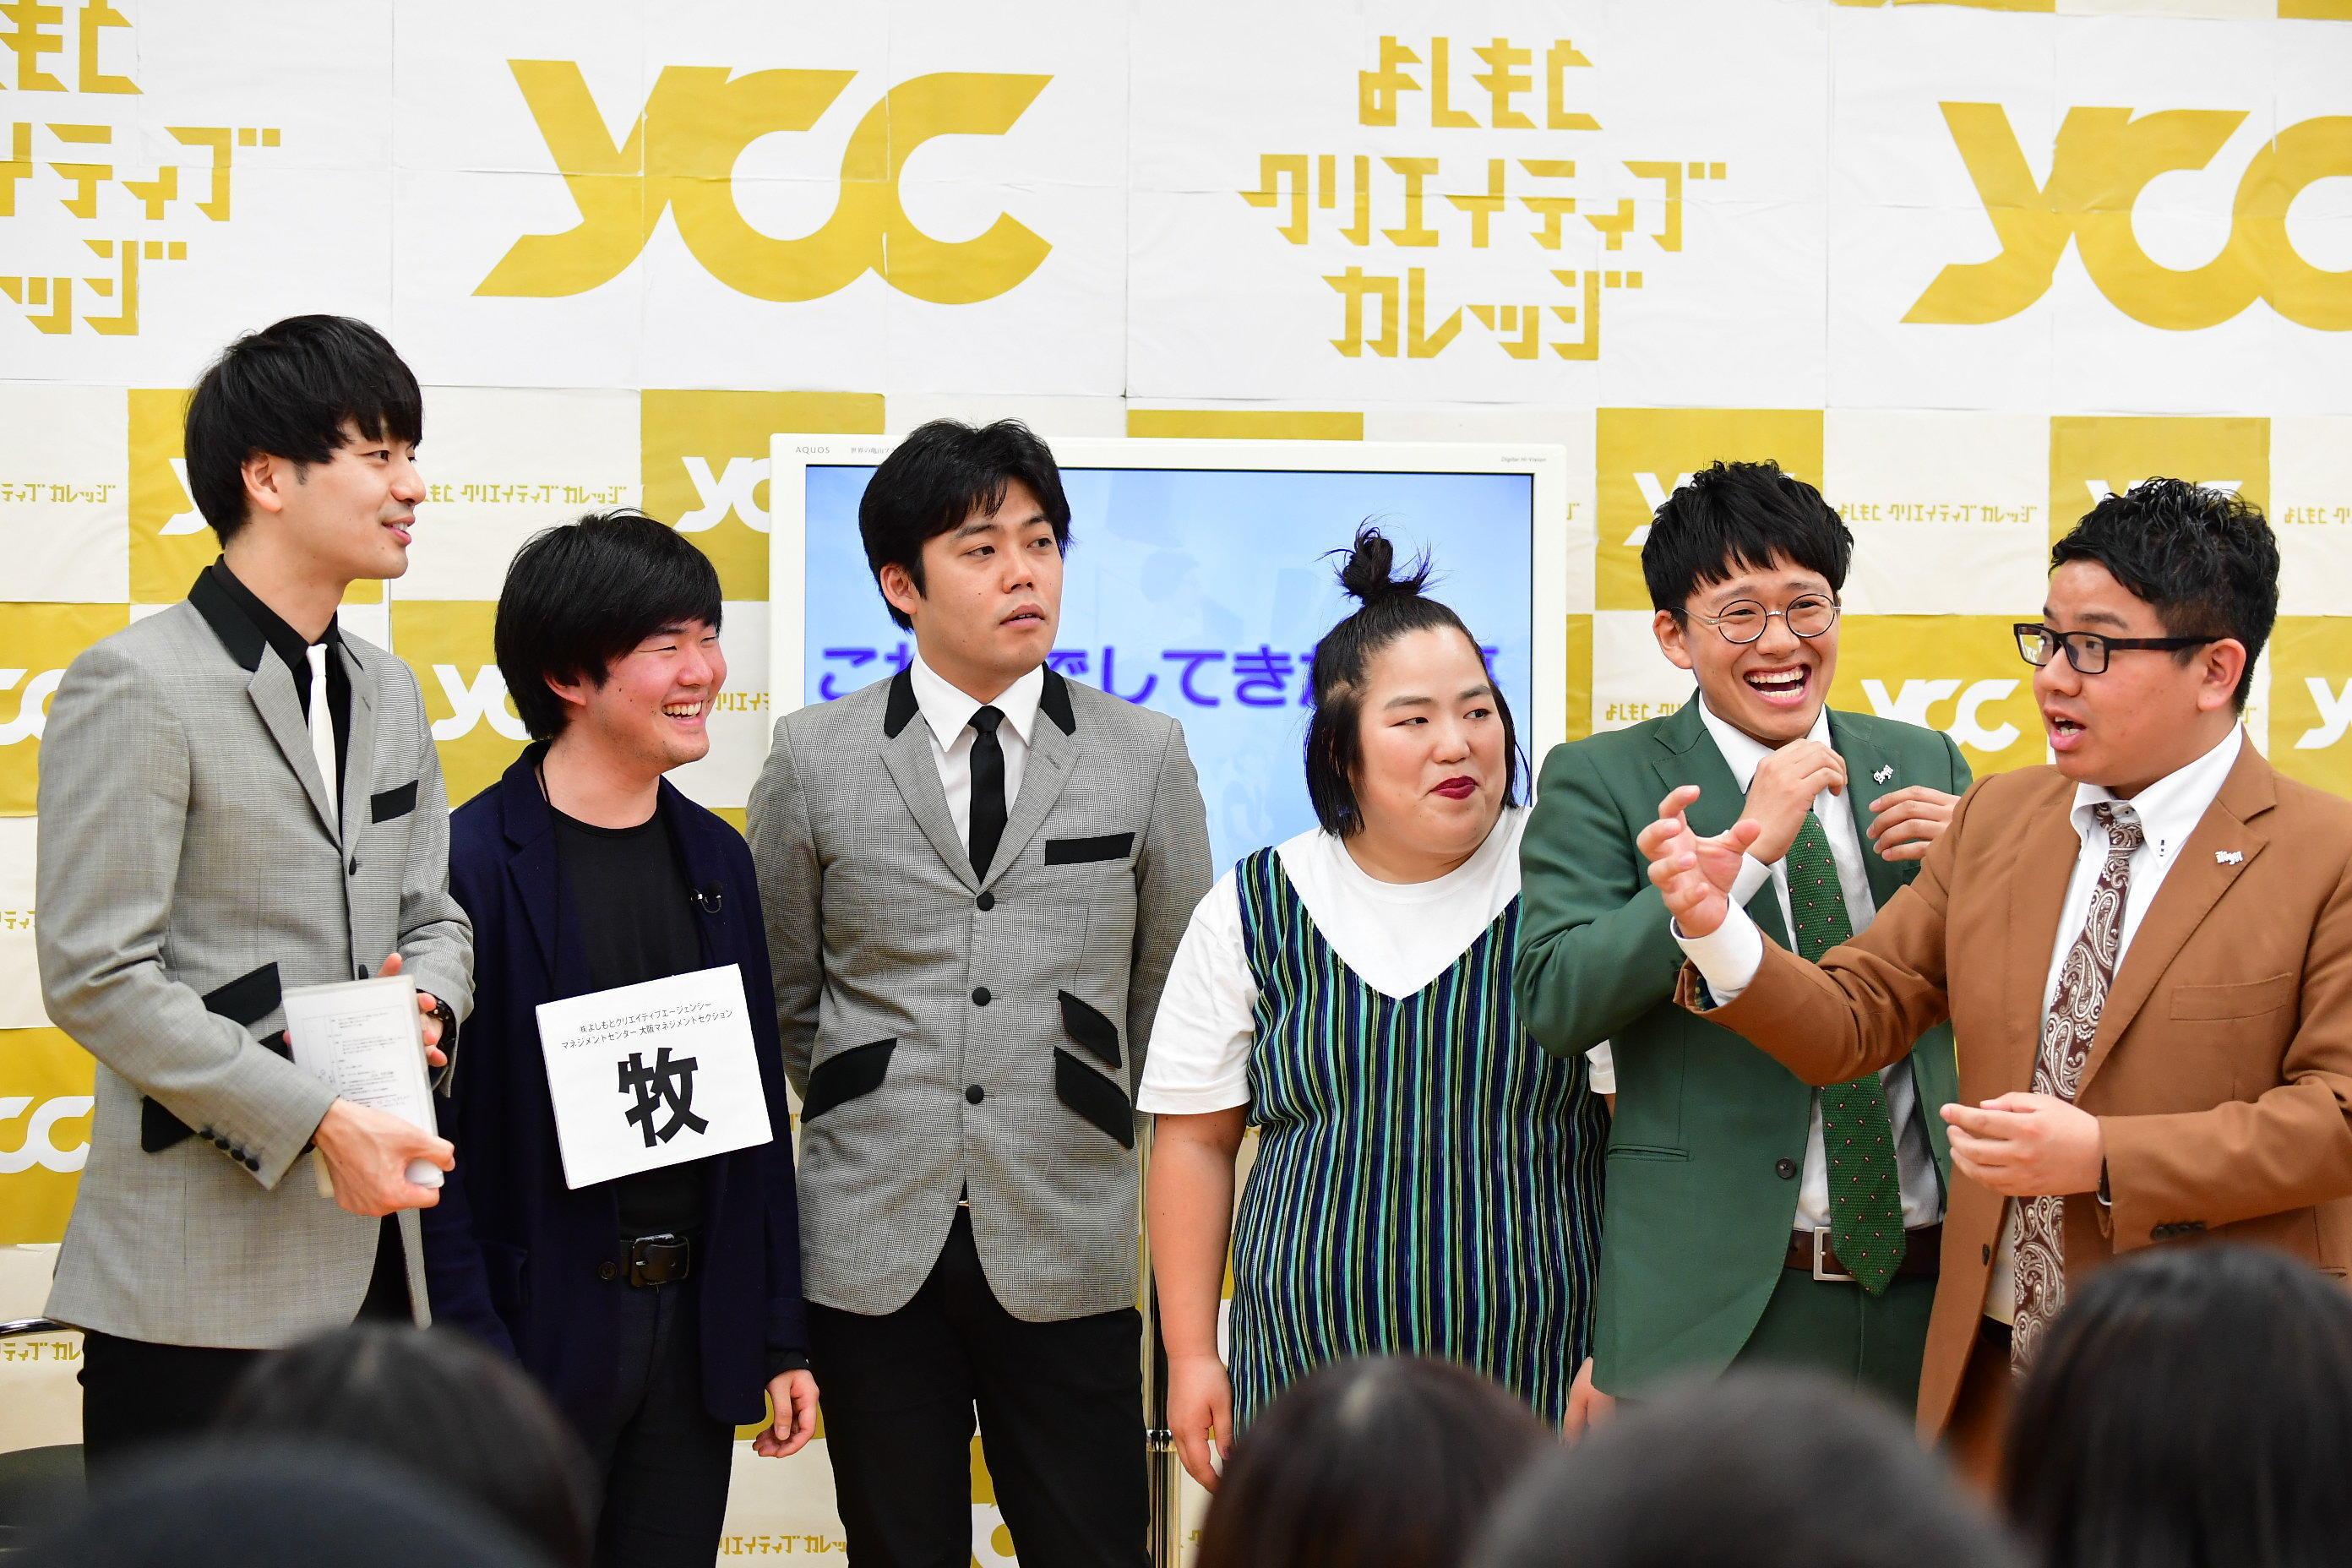 http://news.yoshimoto.co.jp/20180415153610-d11056af31ce3a28ead1758a8fa393380ee15a9f.jpg